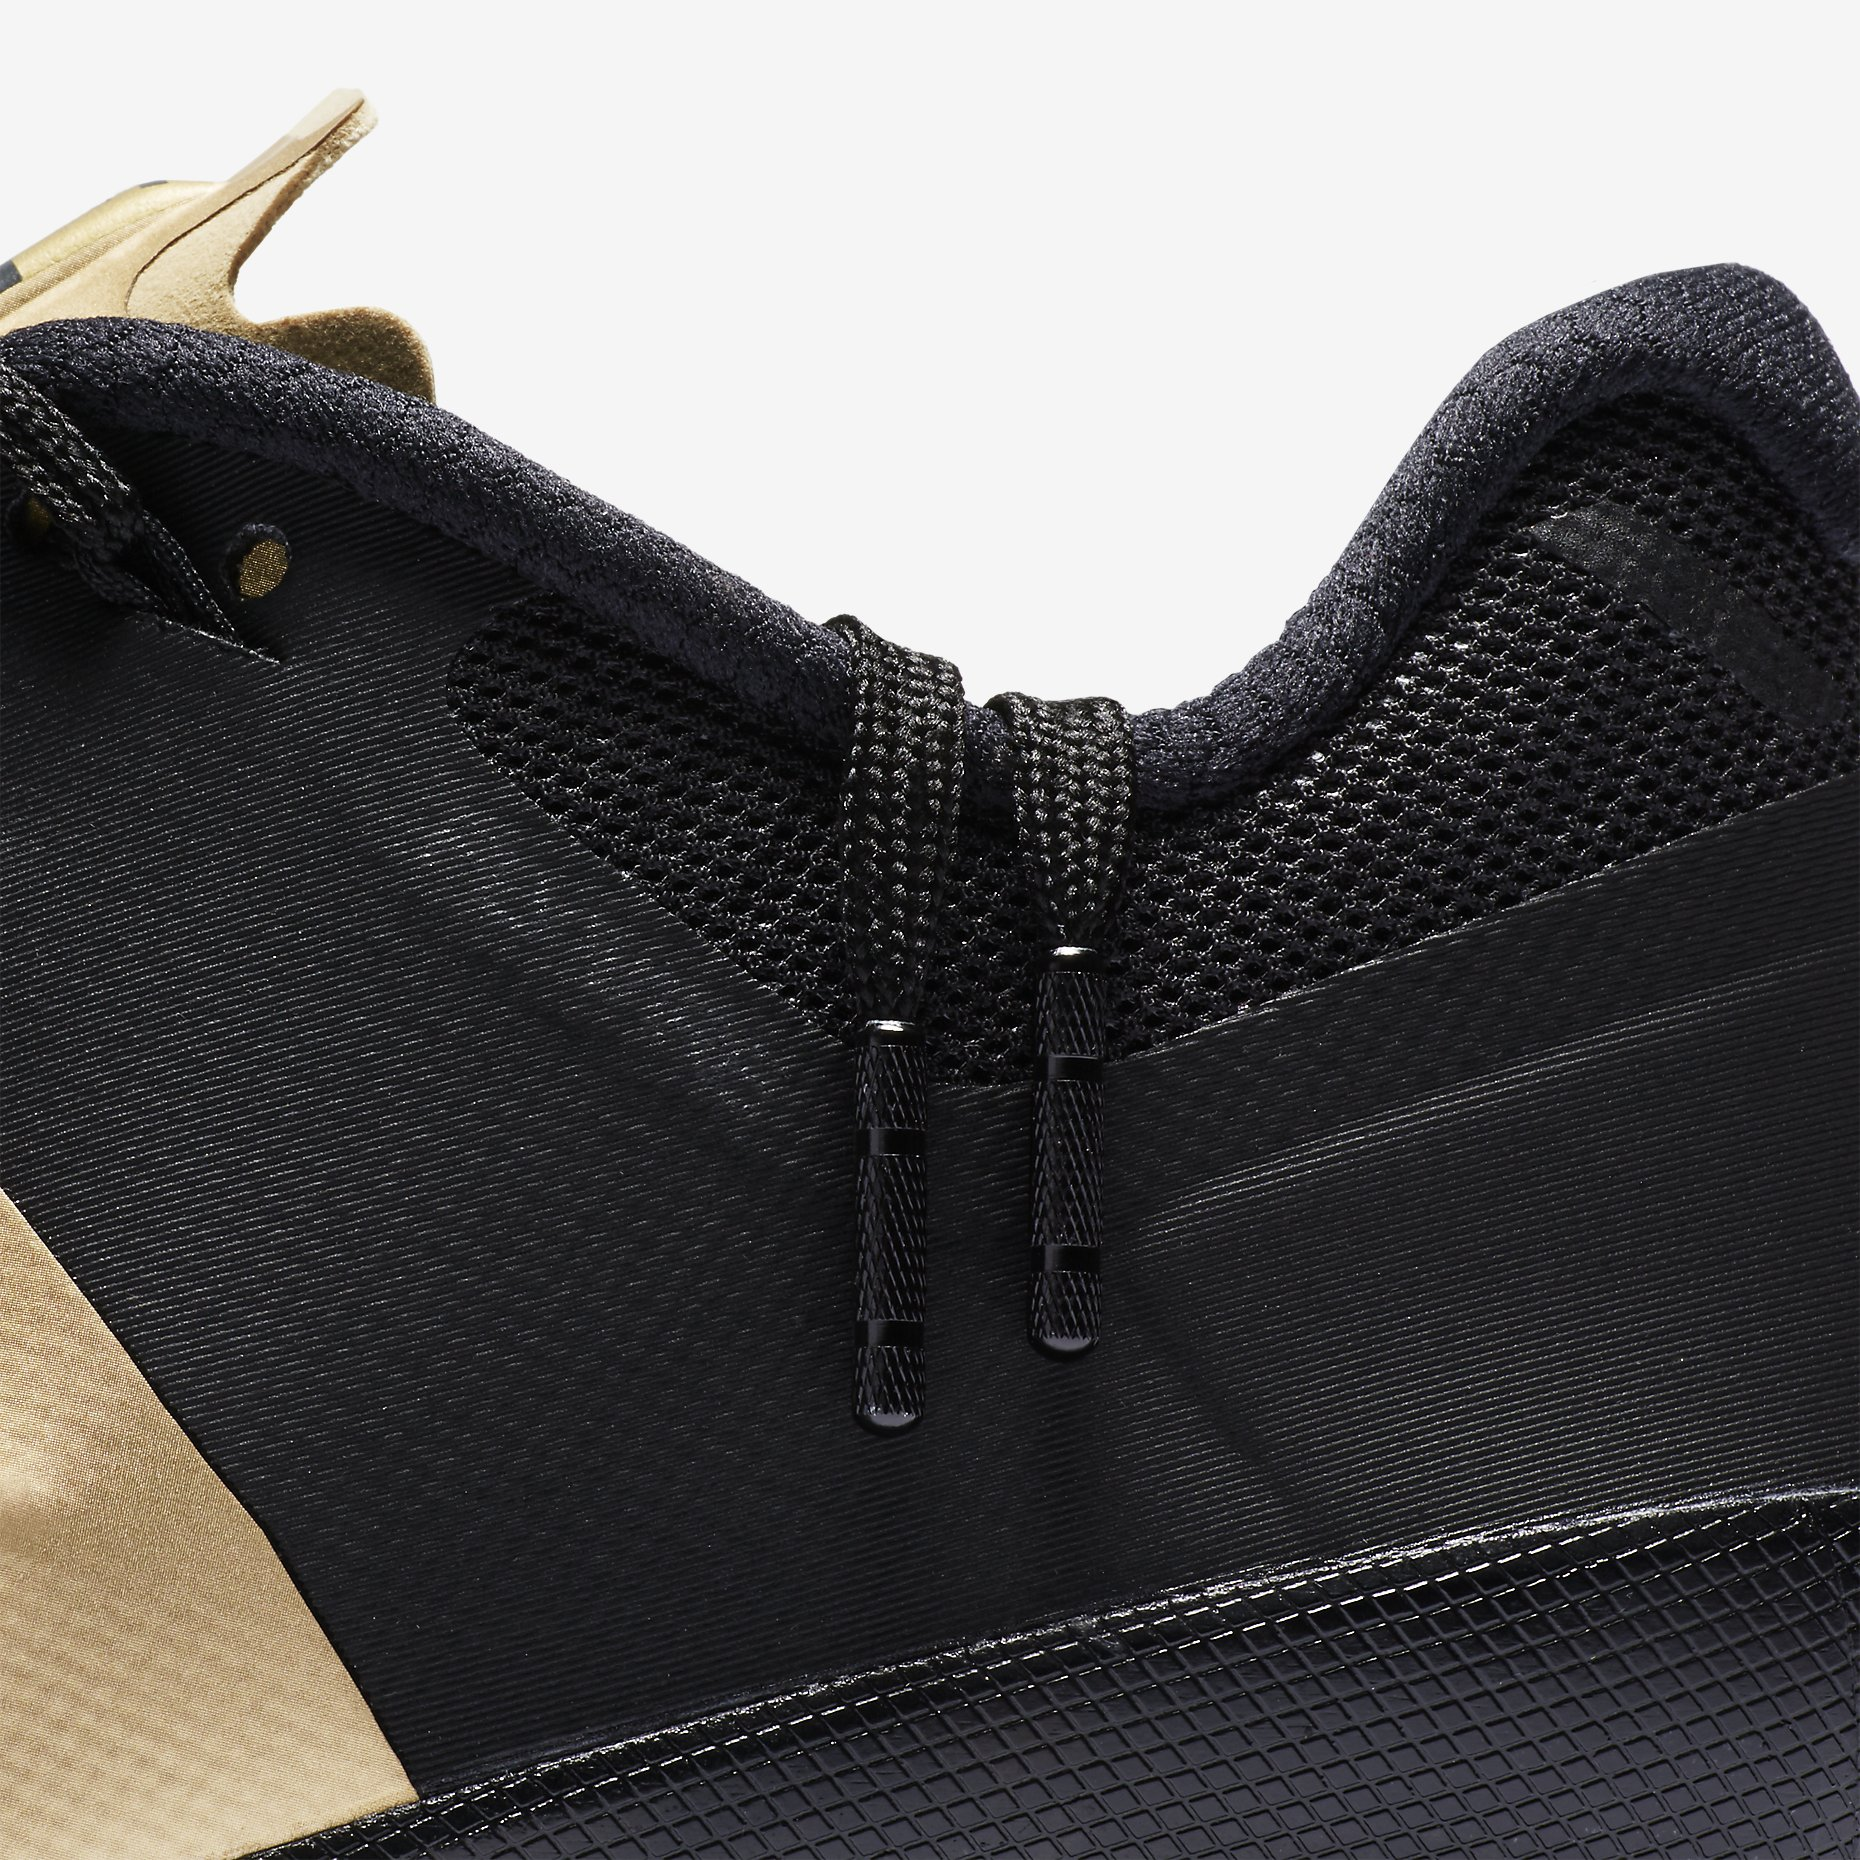 romaleos-3-x-mens-training-shoe (6)